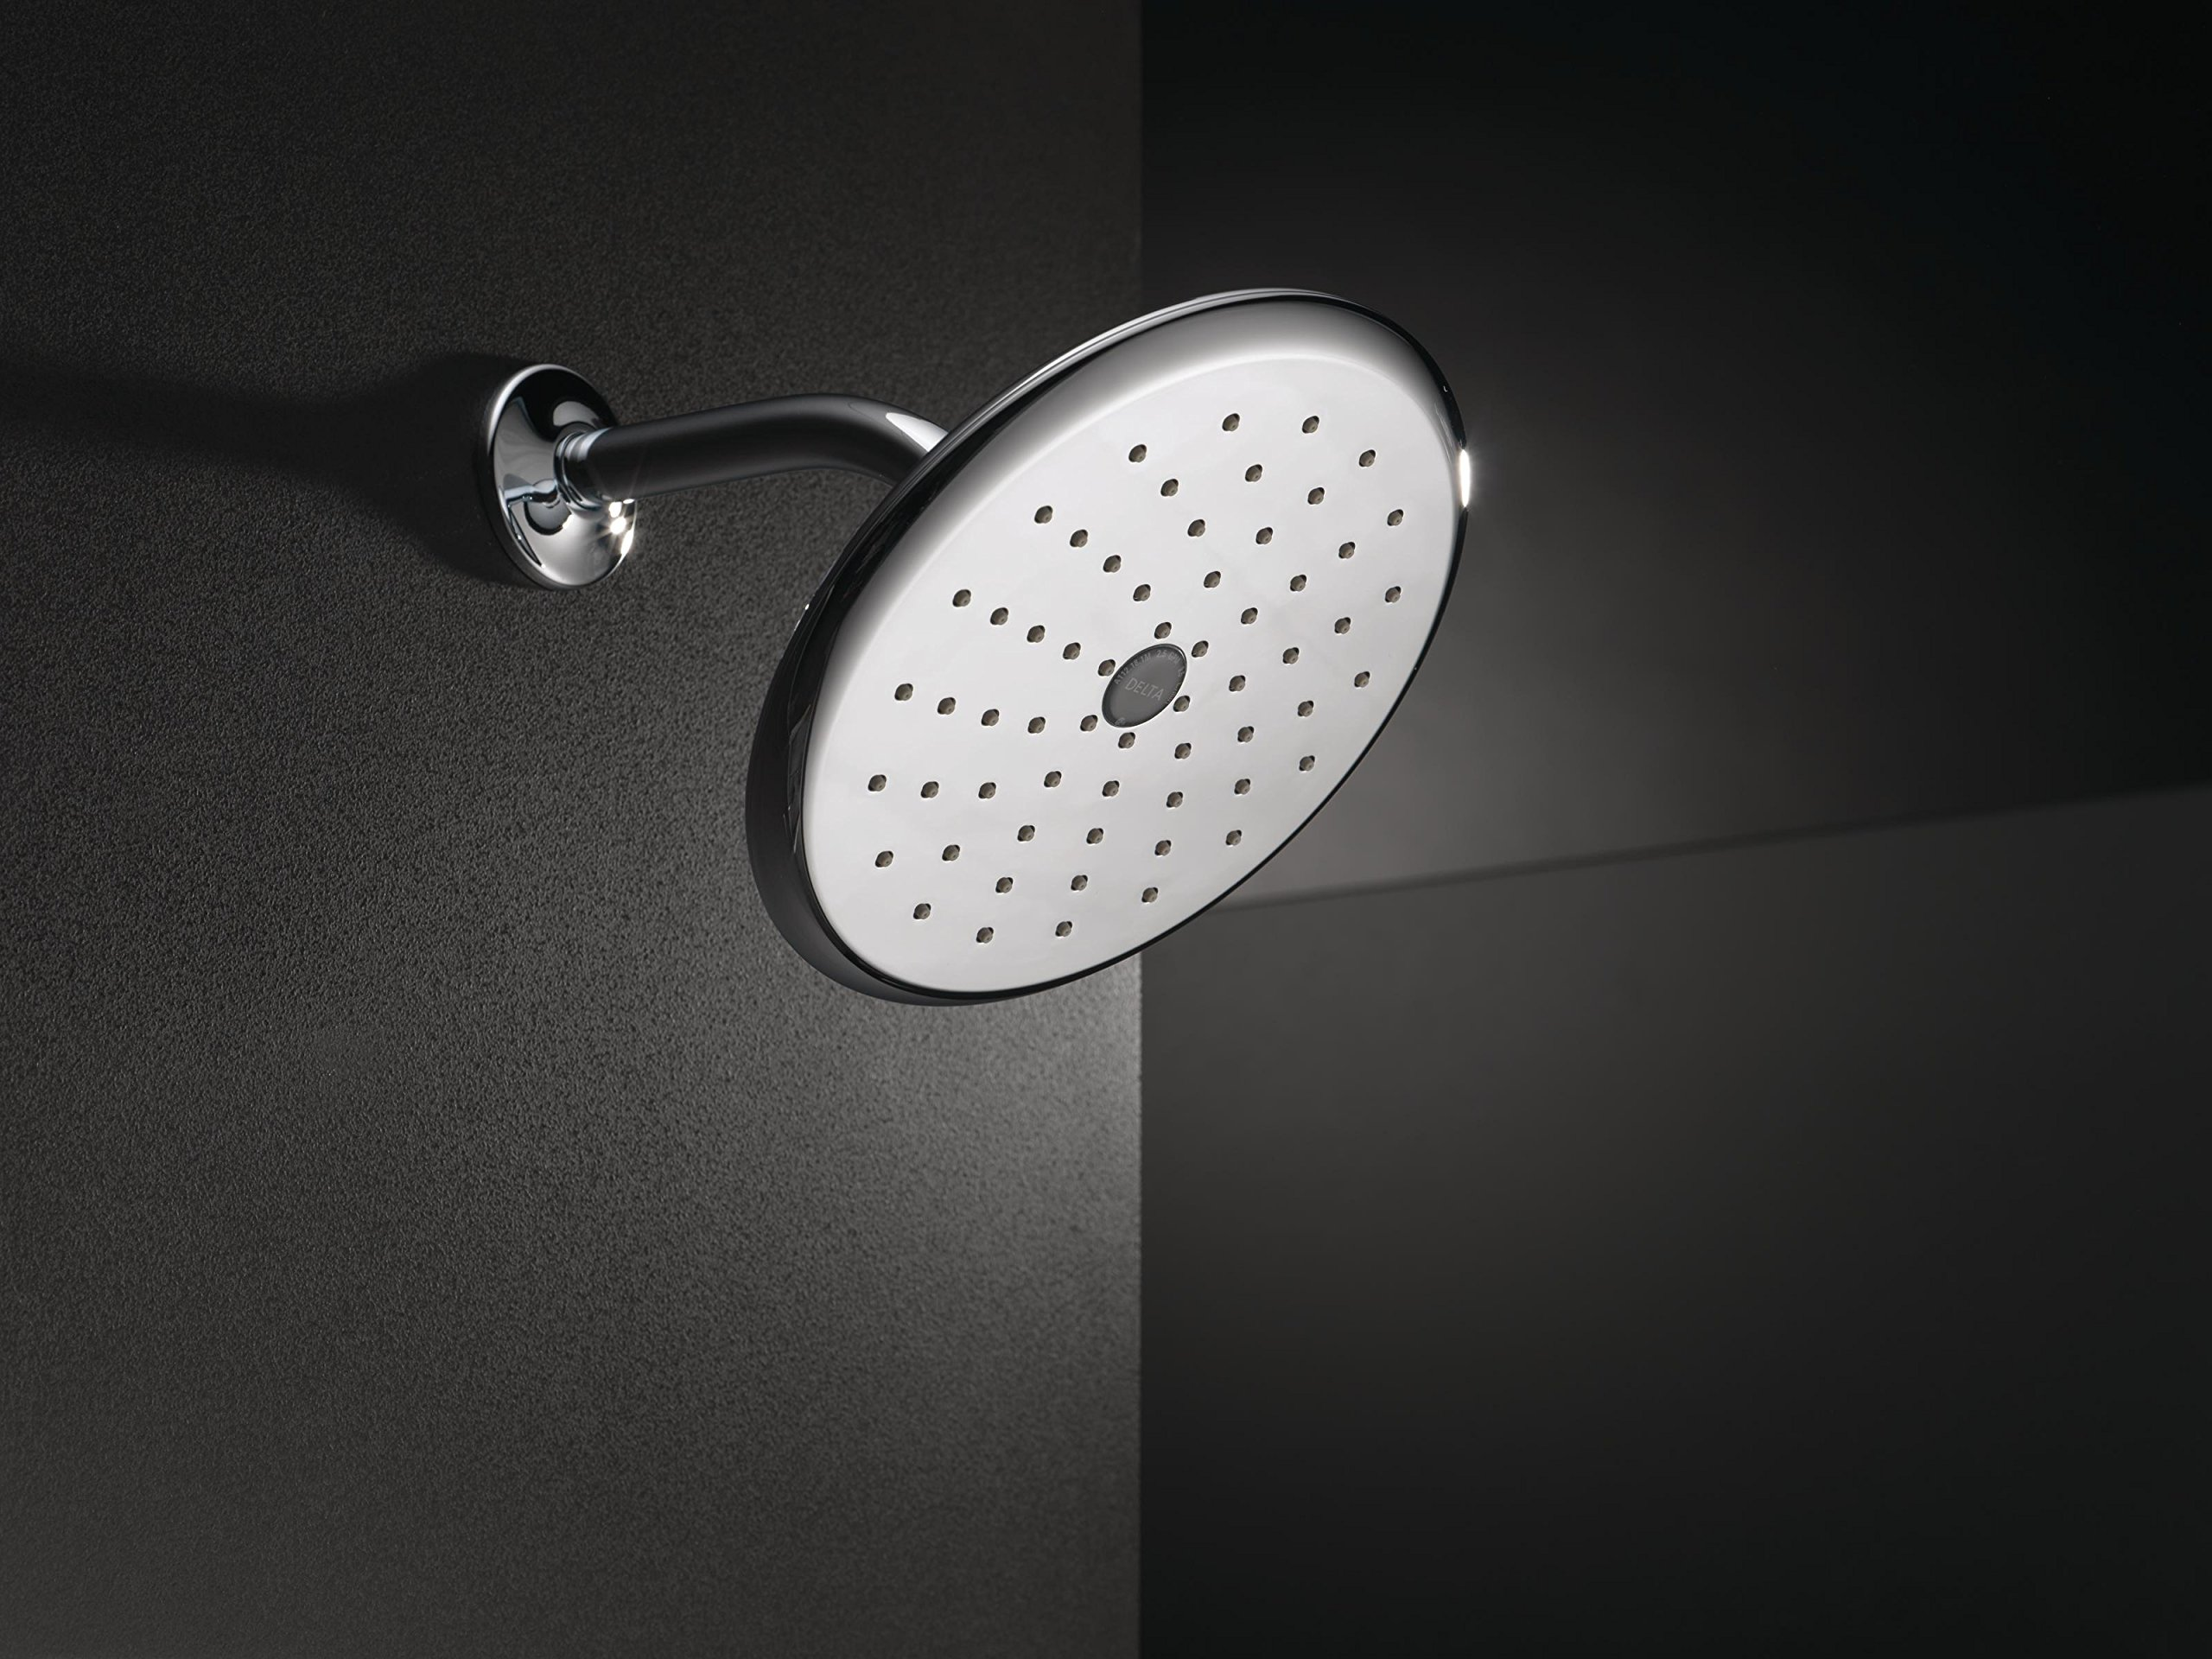 Delta RP52382 Universal Showering Components, Touch-Clean Raincan Showerhead, Chrome by DELTA FAUCET (Image #5)